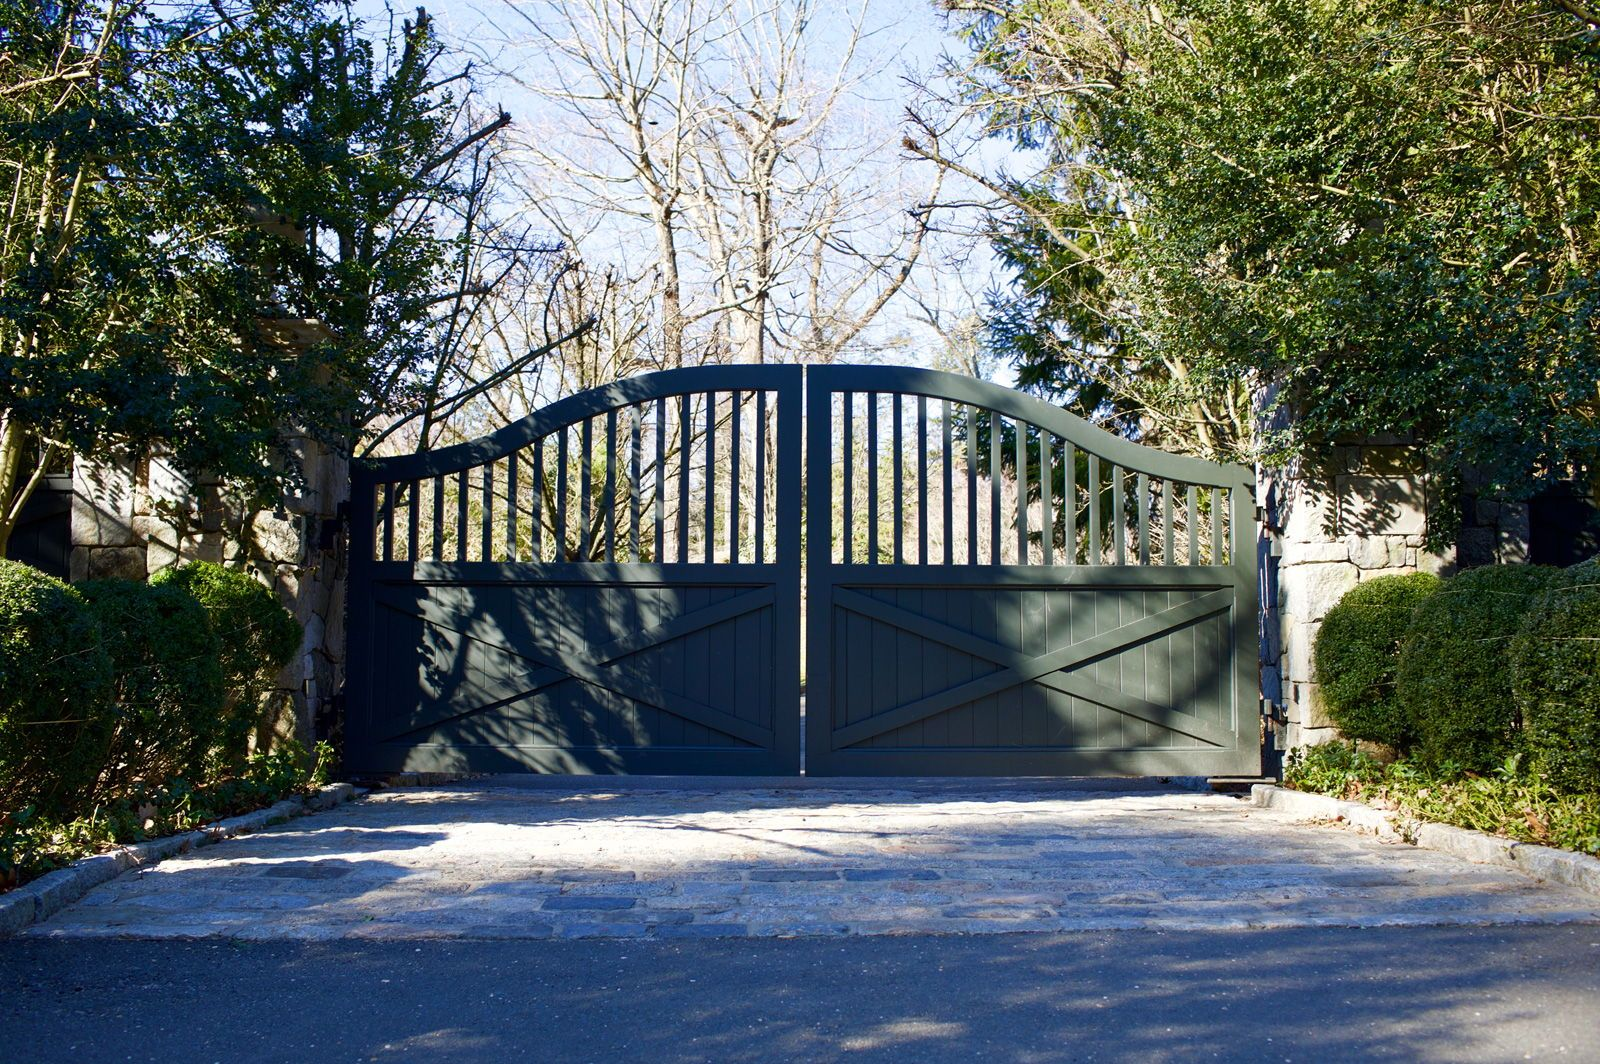 Farmhouse Driveway Gate Gets A Modern Look With Dark Paint Driveway Gate Entrance Gates Driveway Entrance Gates